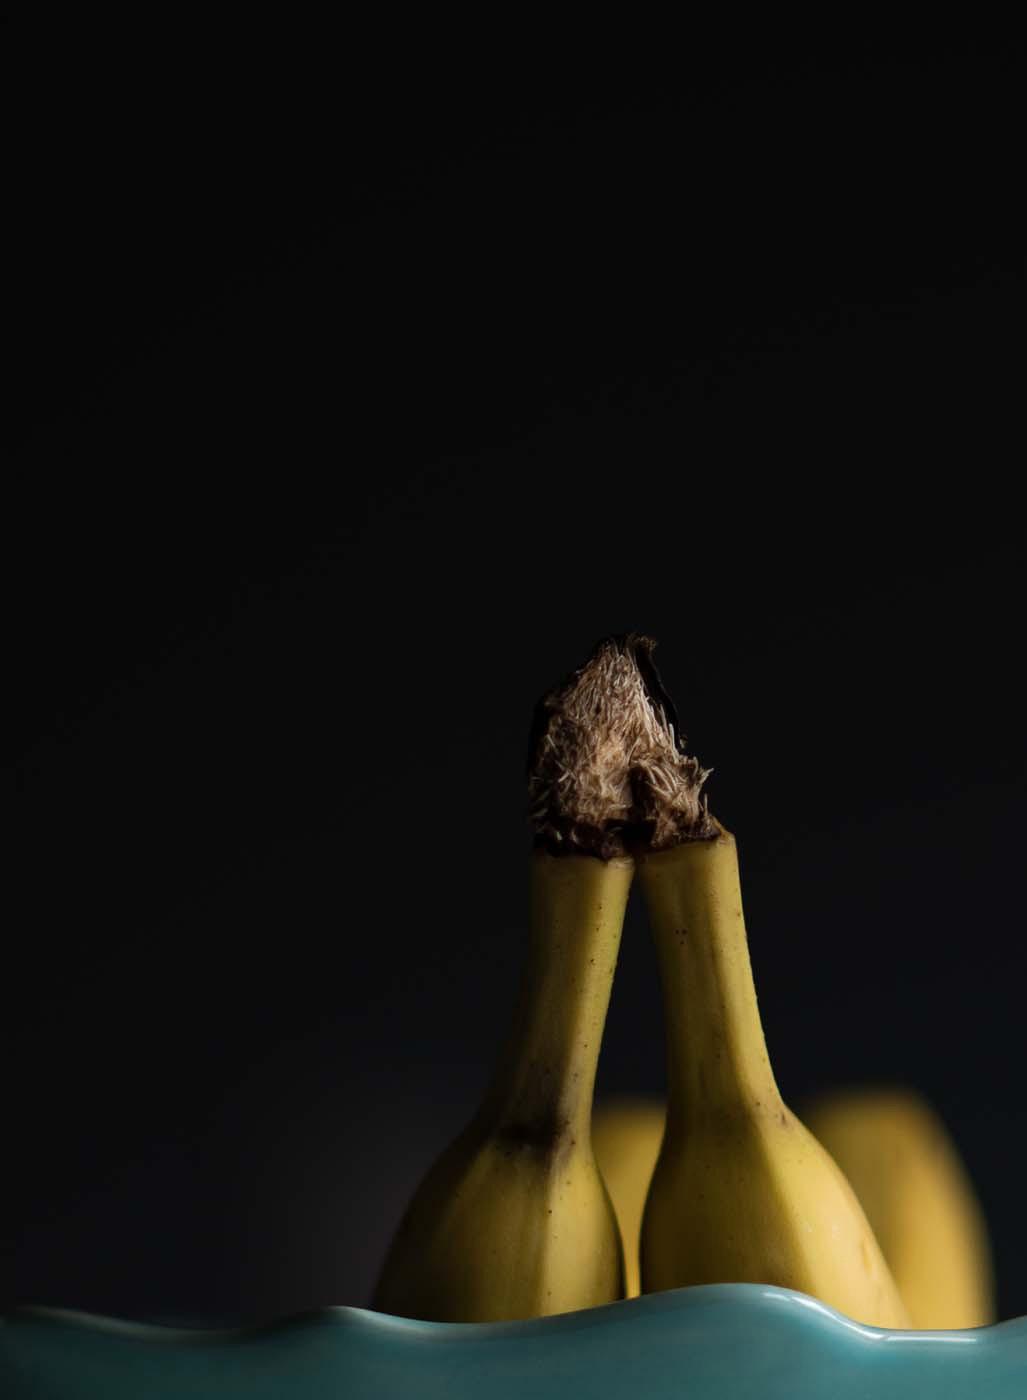 Bananas in Low Light by Jana O'Flaherty